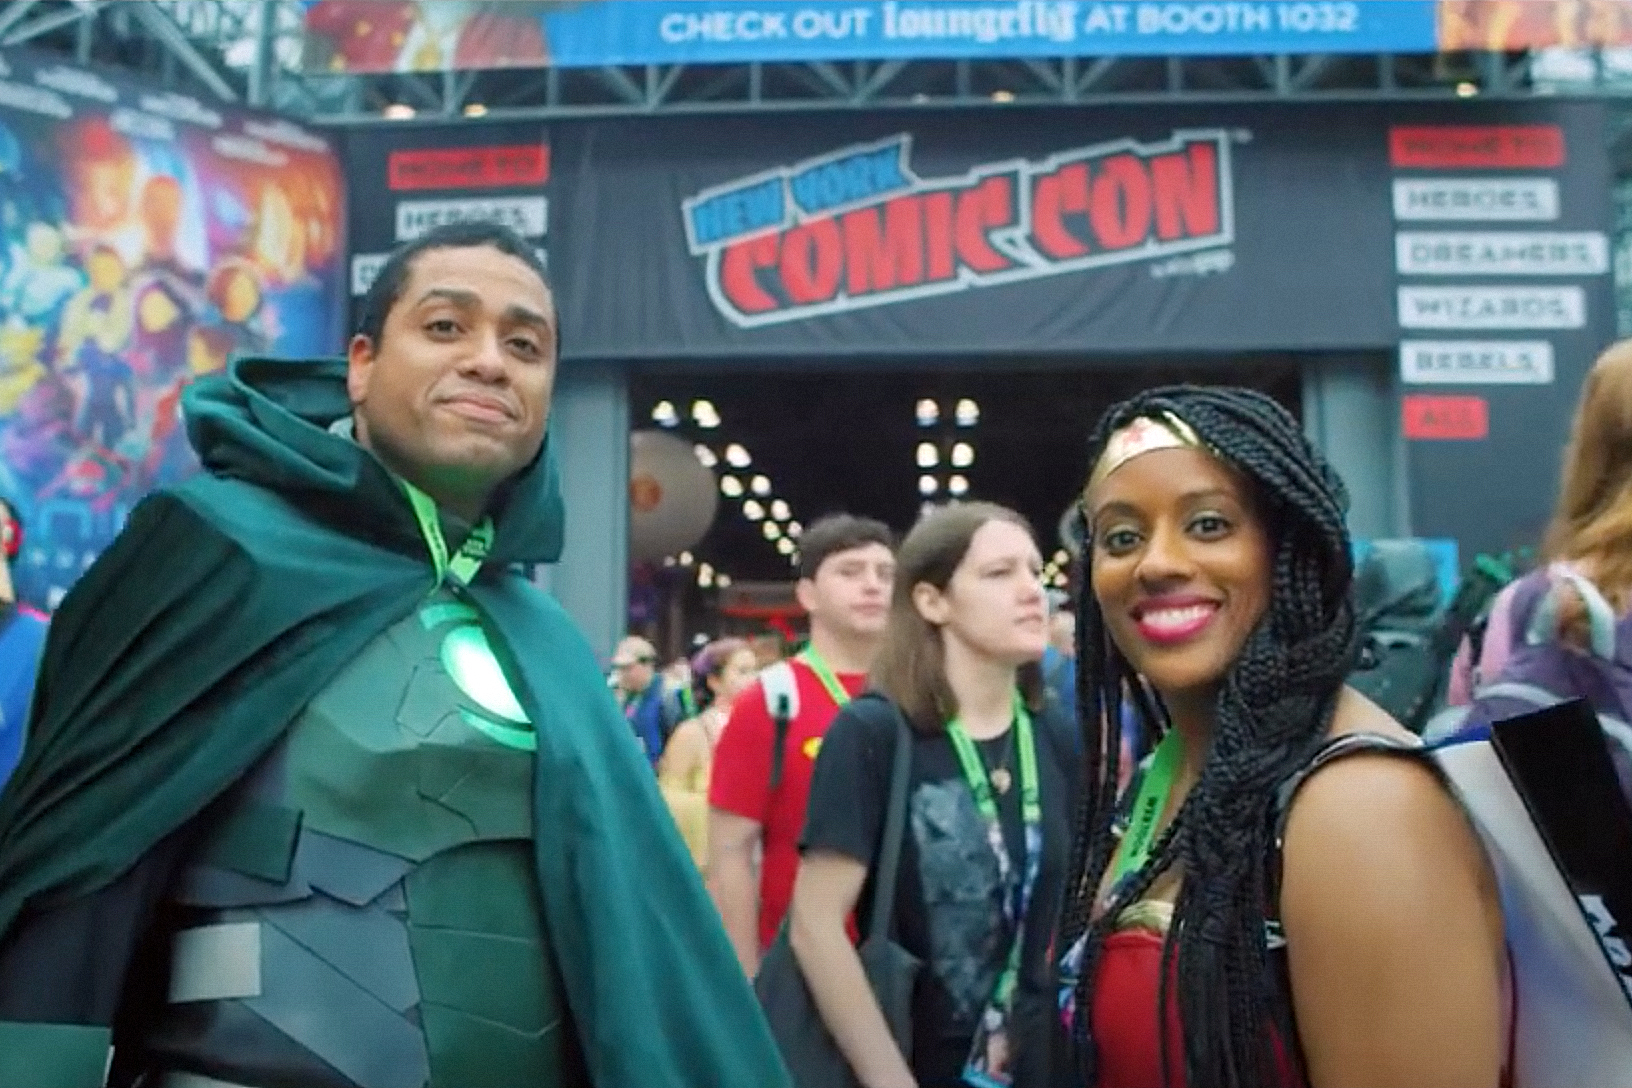 The Week Ahead: Comic Con goes virtual and 'Brandemonium' takes over Cincinnati